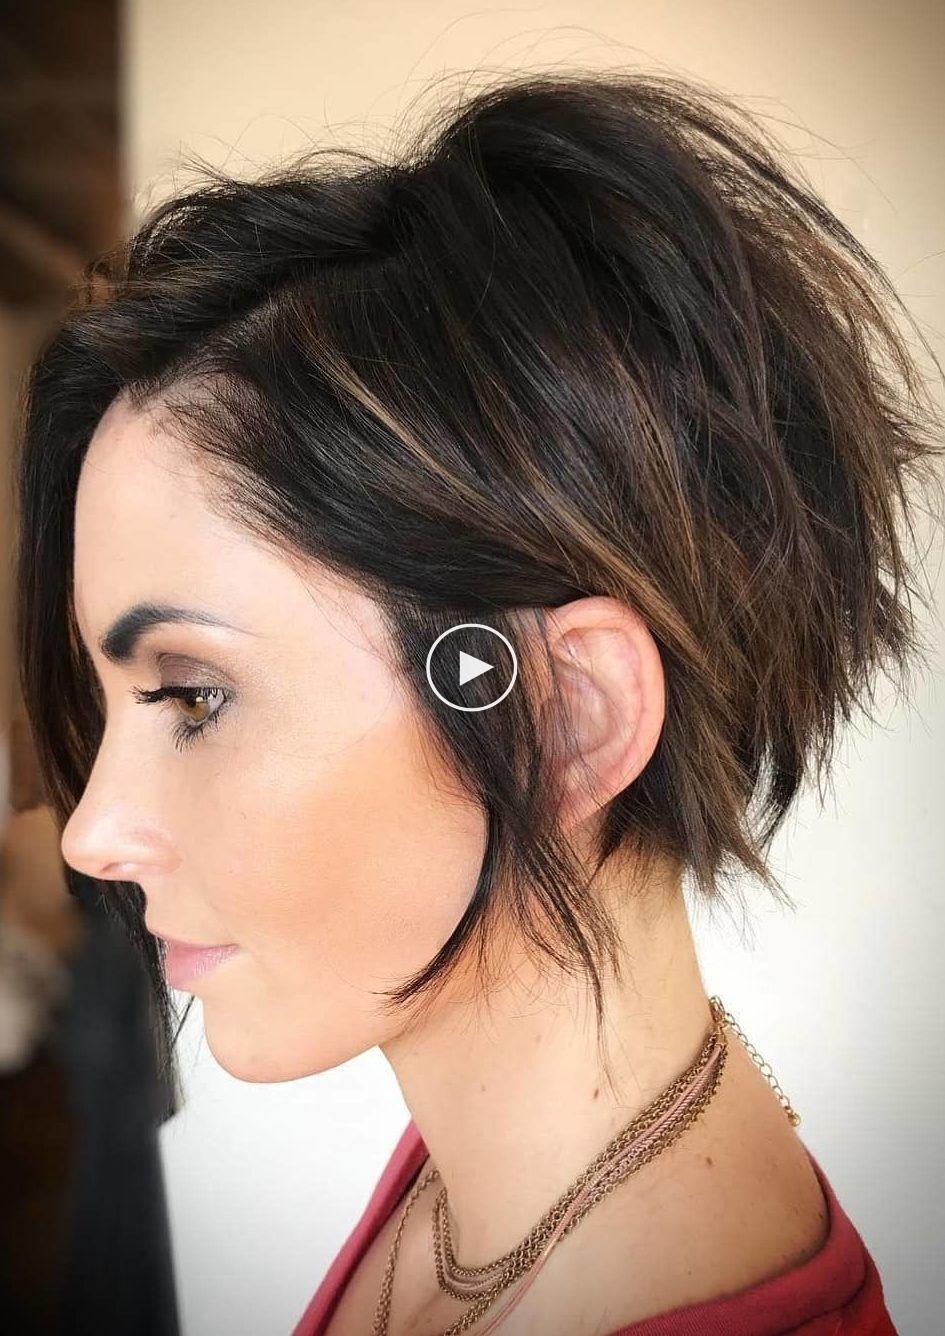 23 Nieuwste Korte Kapsels Voor 2019 Kapselinspiraties Voor Iedereen Pixie Haircut For Thick Hair Thick Hair Styles Short Hair With Layers